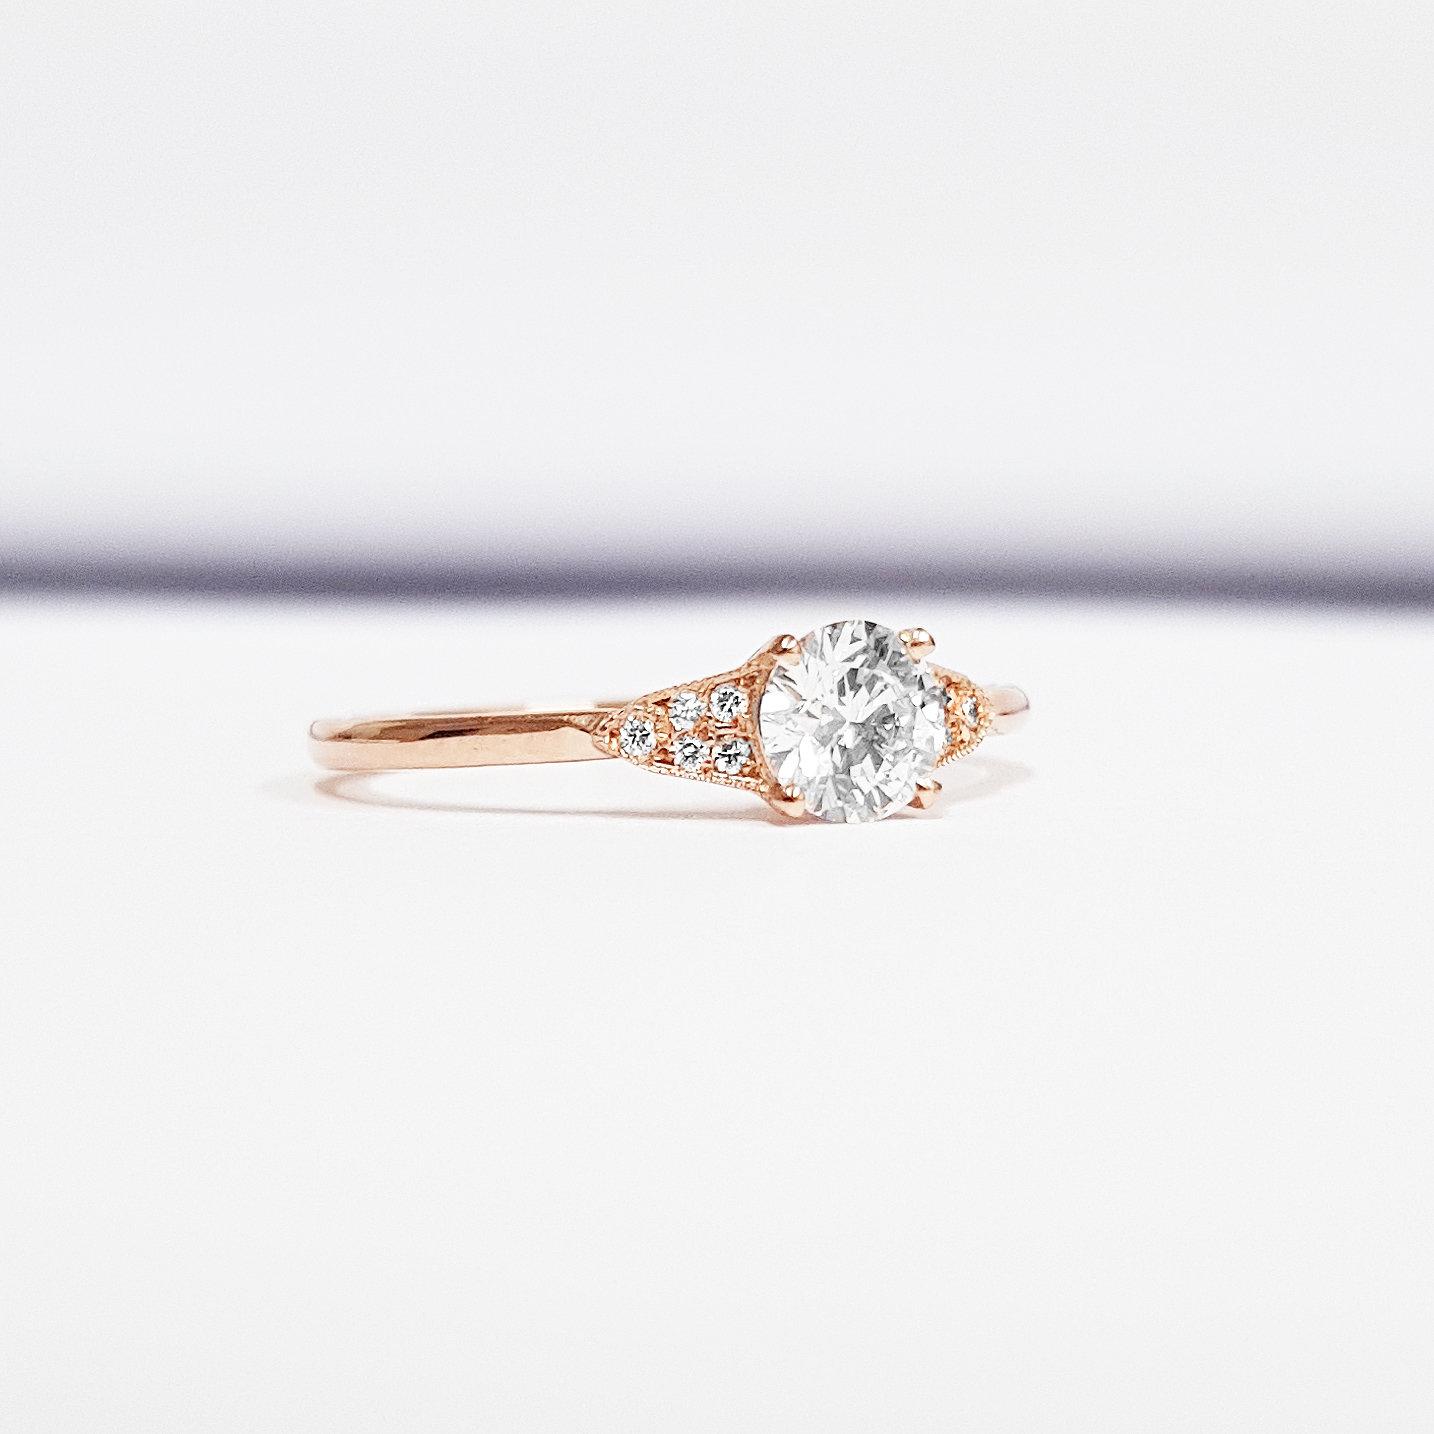 Moissanite and diamond engagement ring handmade in gold or platinum antique  1920s art deco inspired